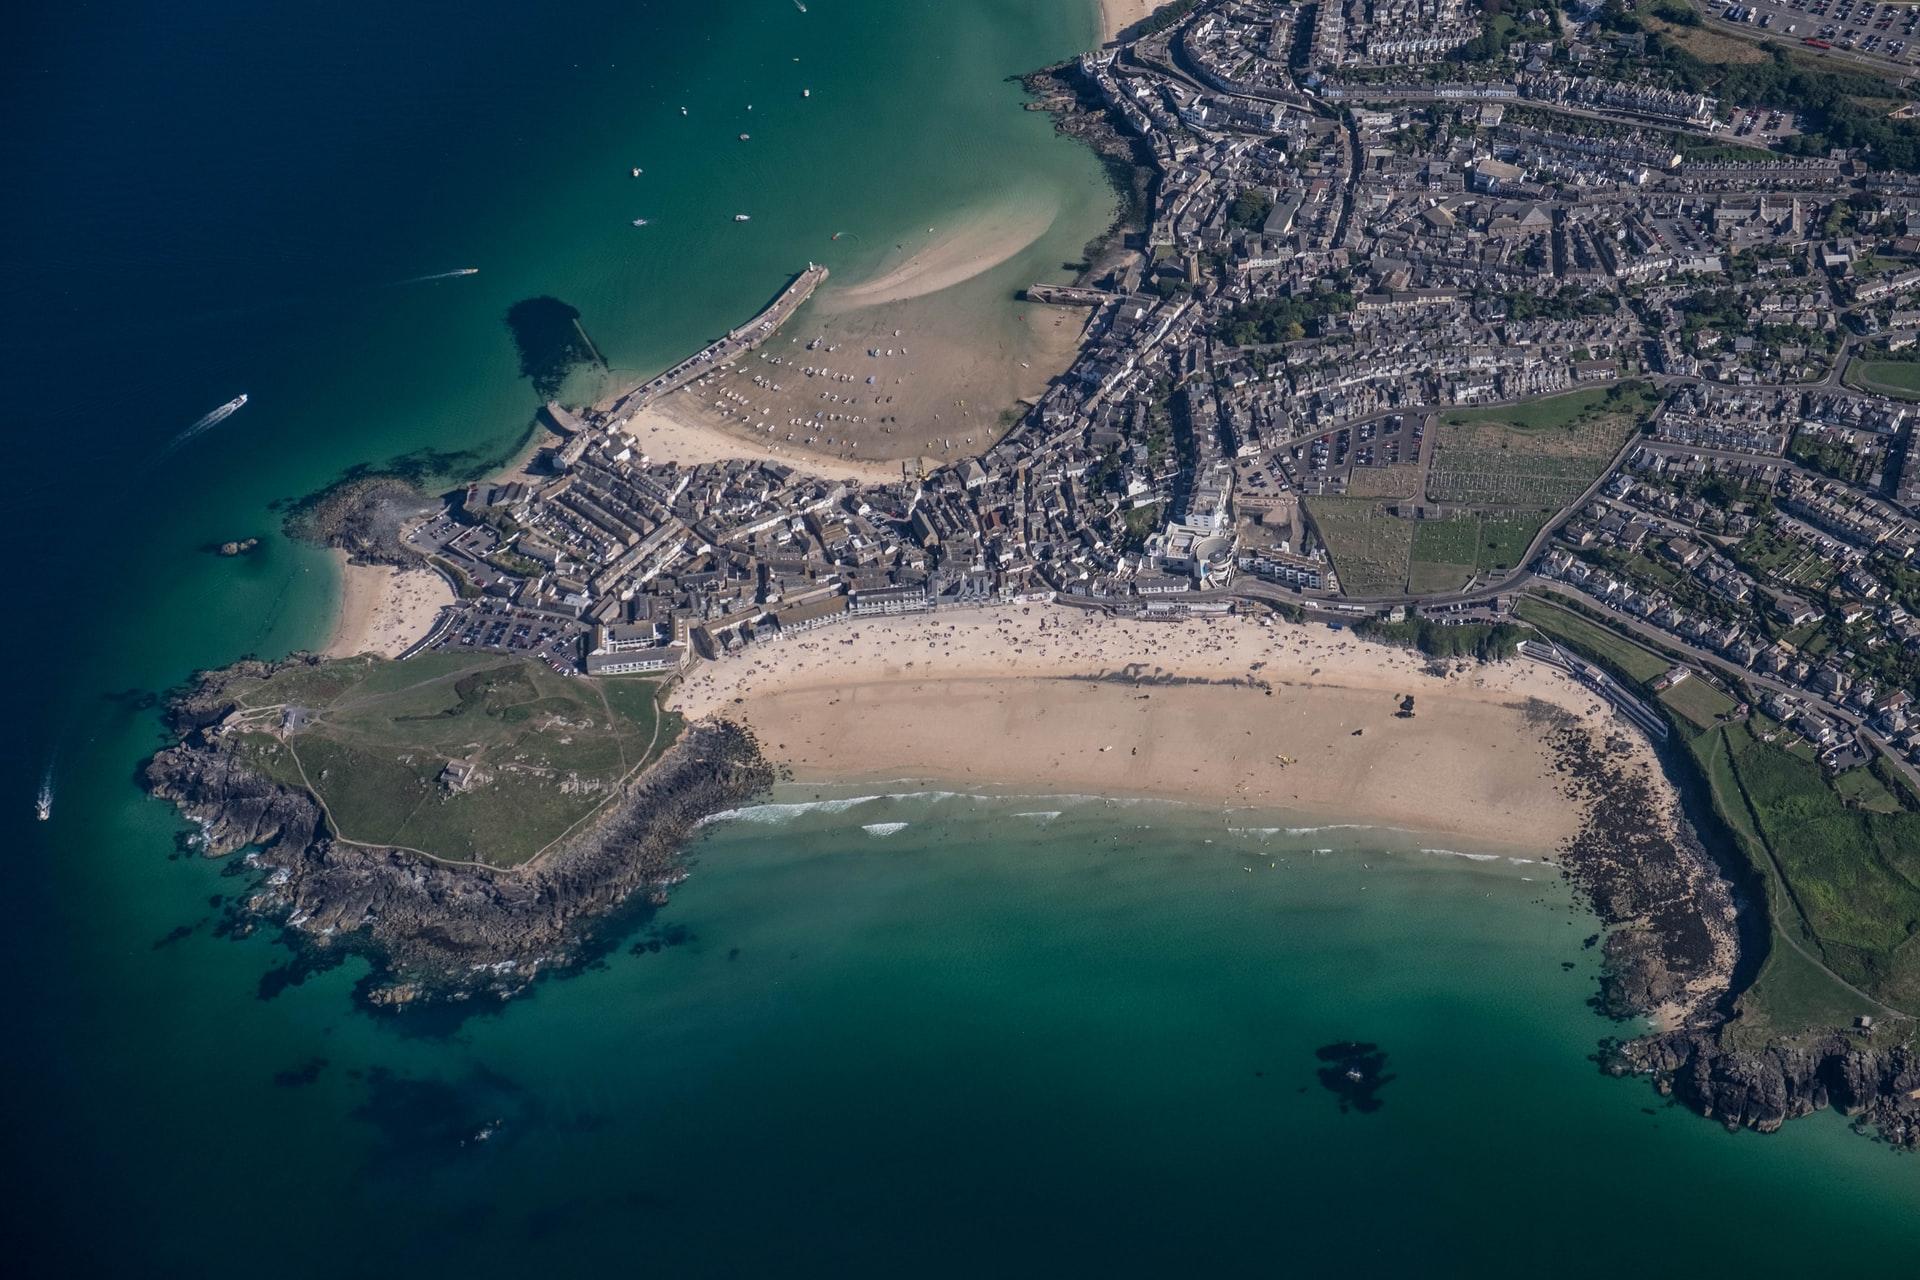 porthminster beach plage royaume uni Cornouailles